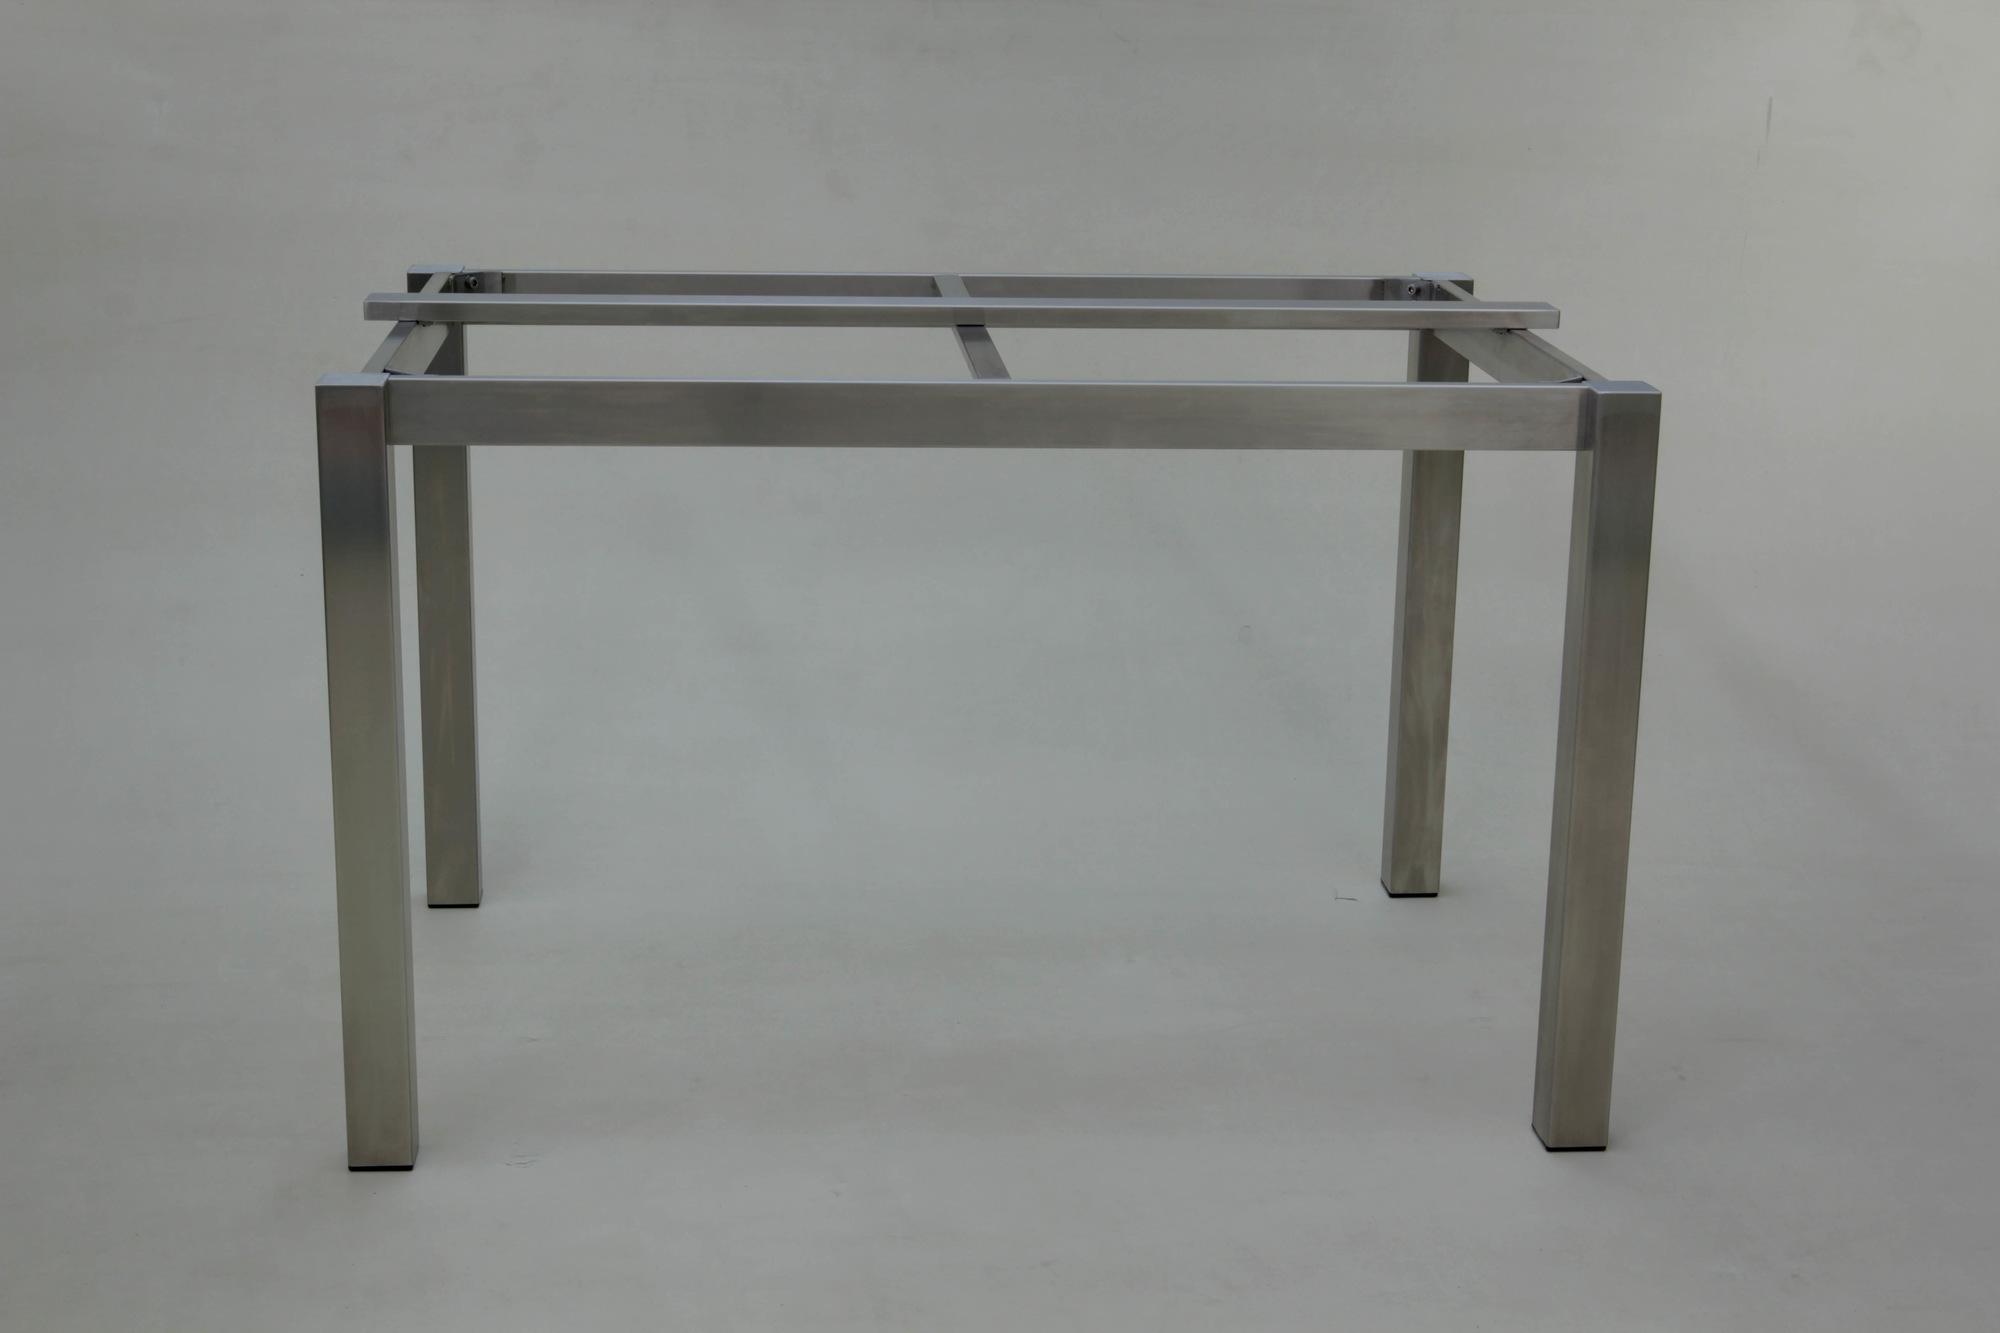 1539182523-gartenmoebel-130x80cm-granittisch-candle-na_1.jpg